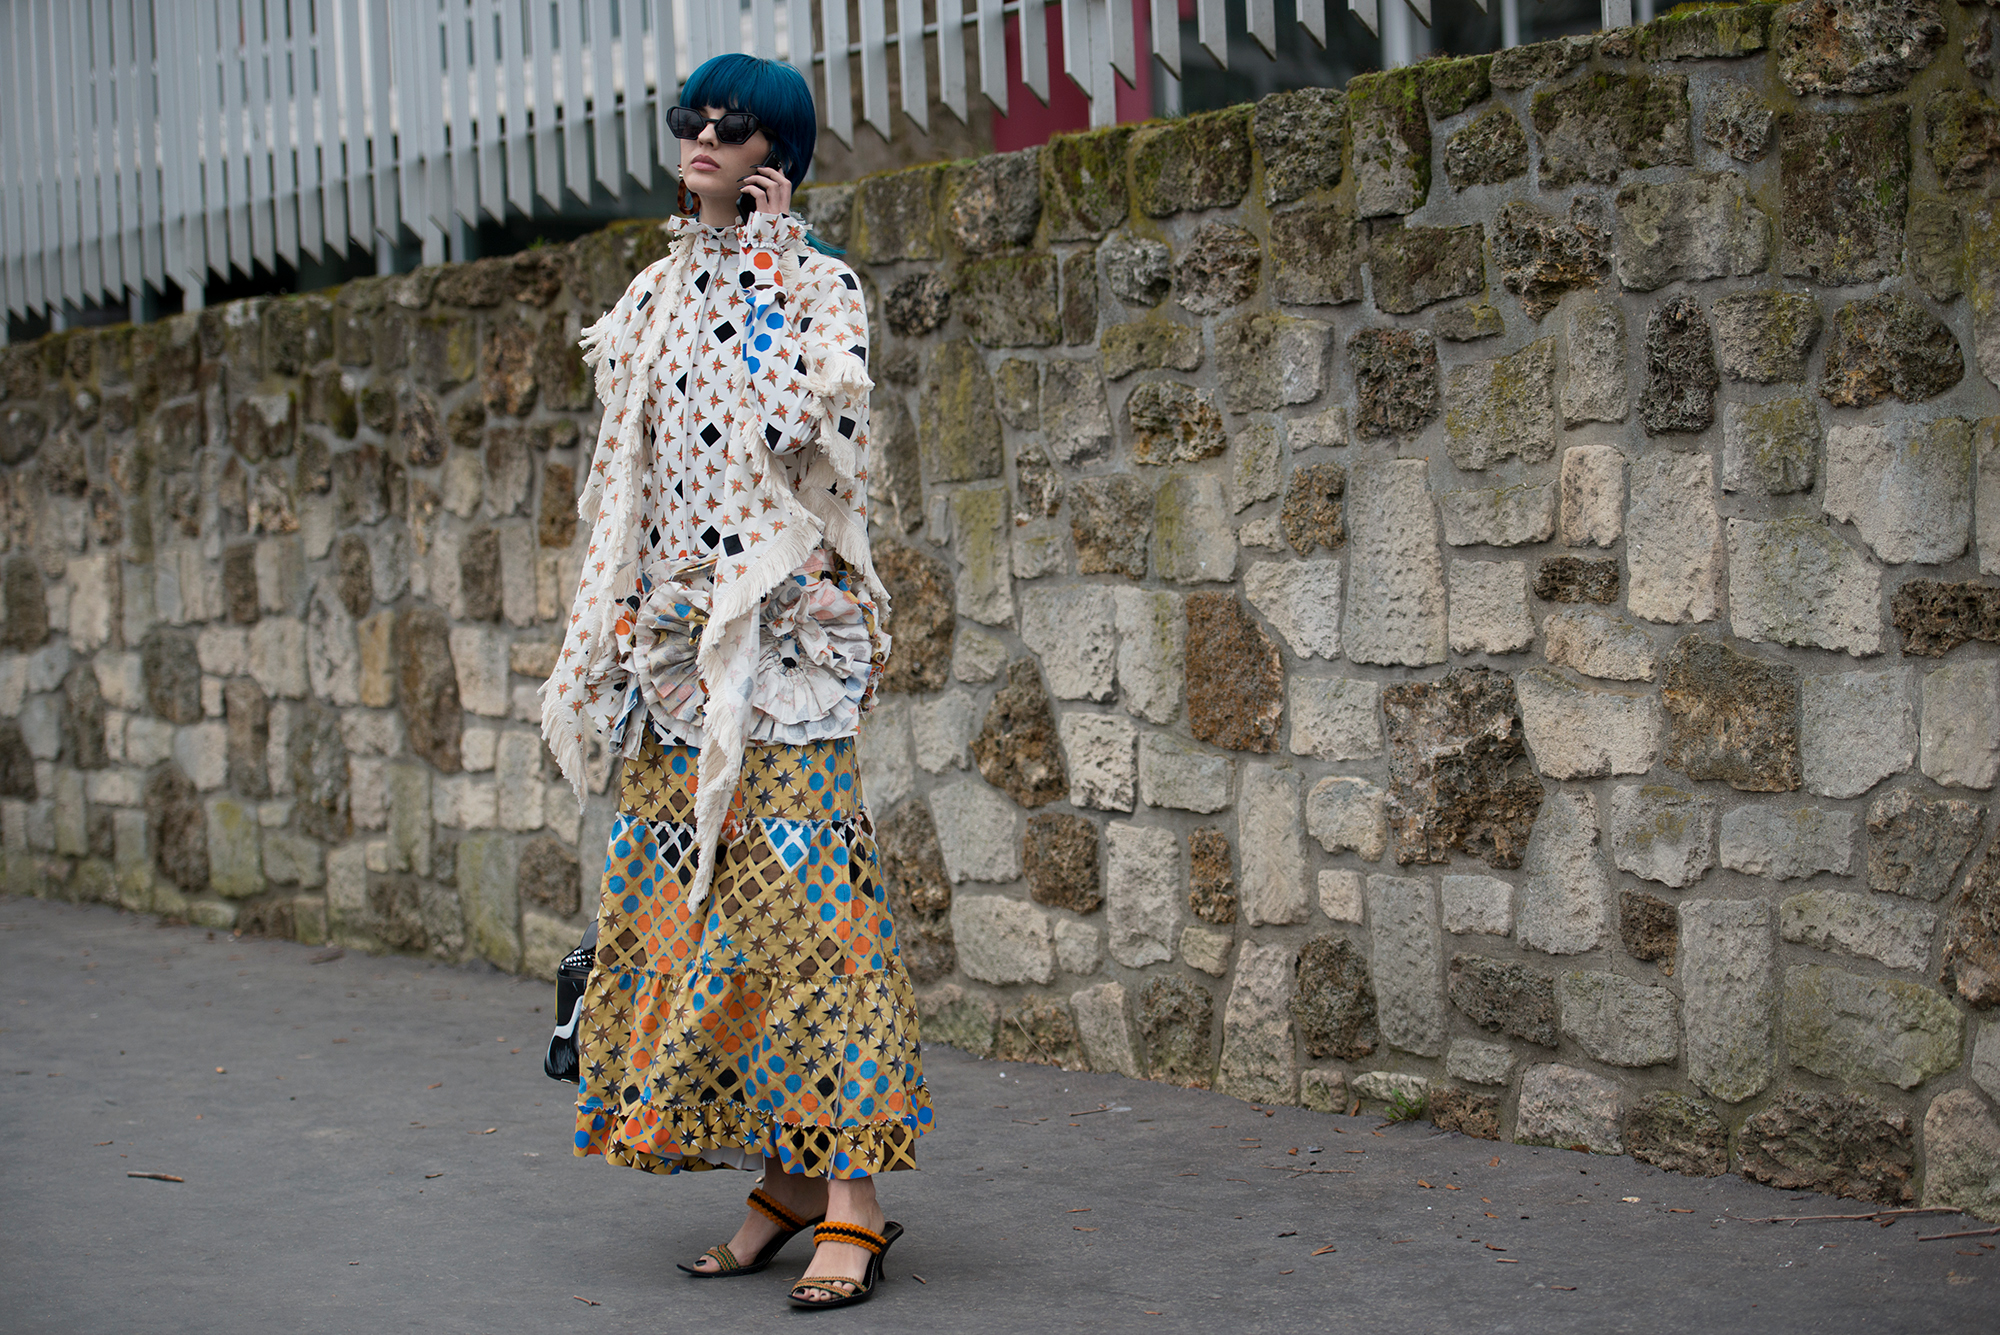 Streetsnaps Paris Fashion Week March 2017 Part 2 - 3747935